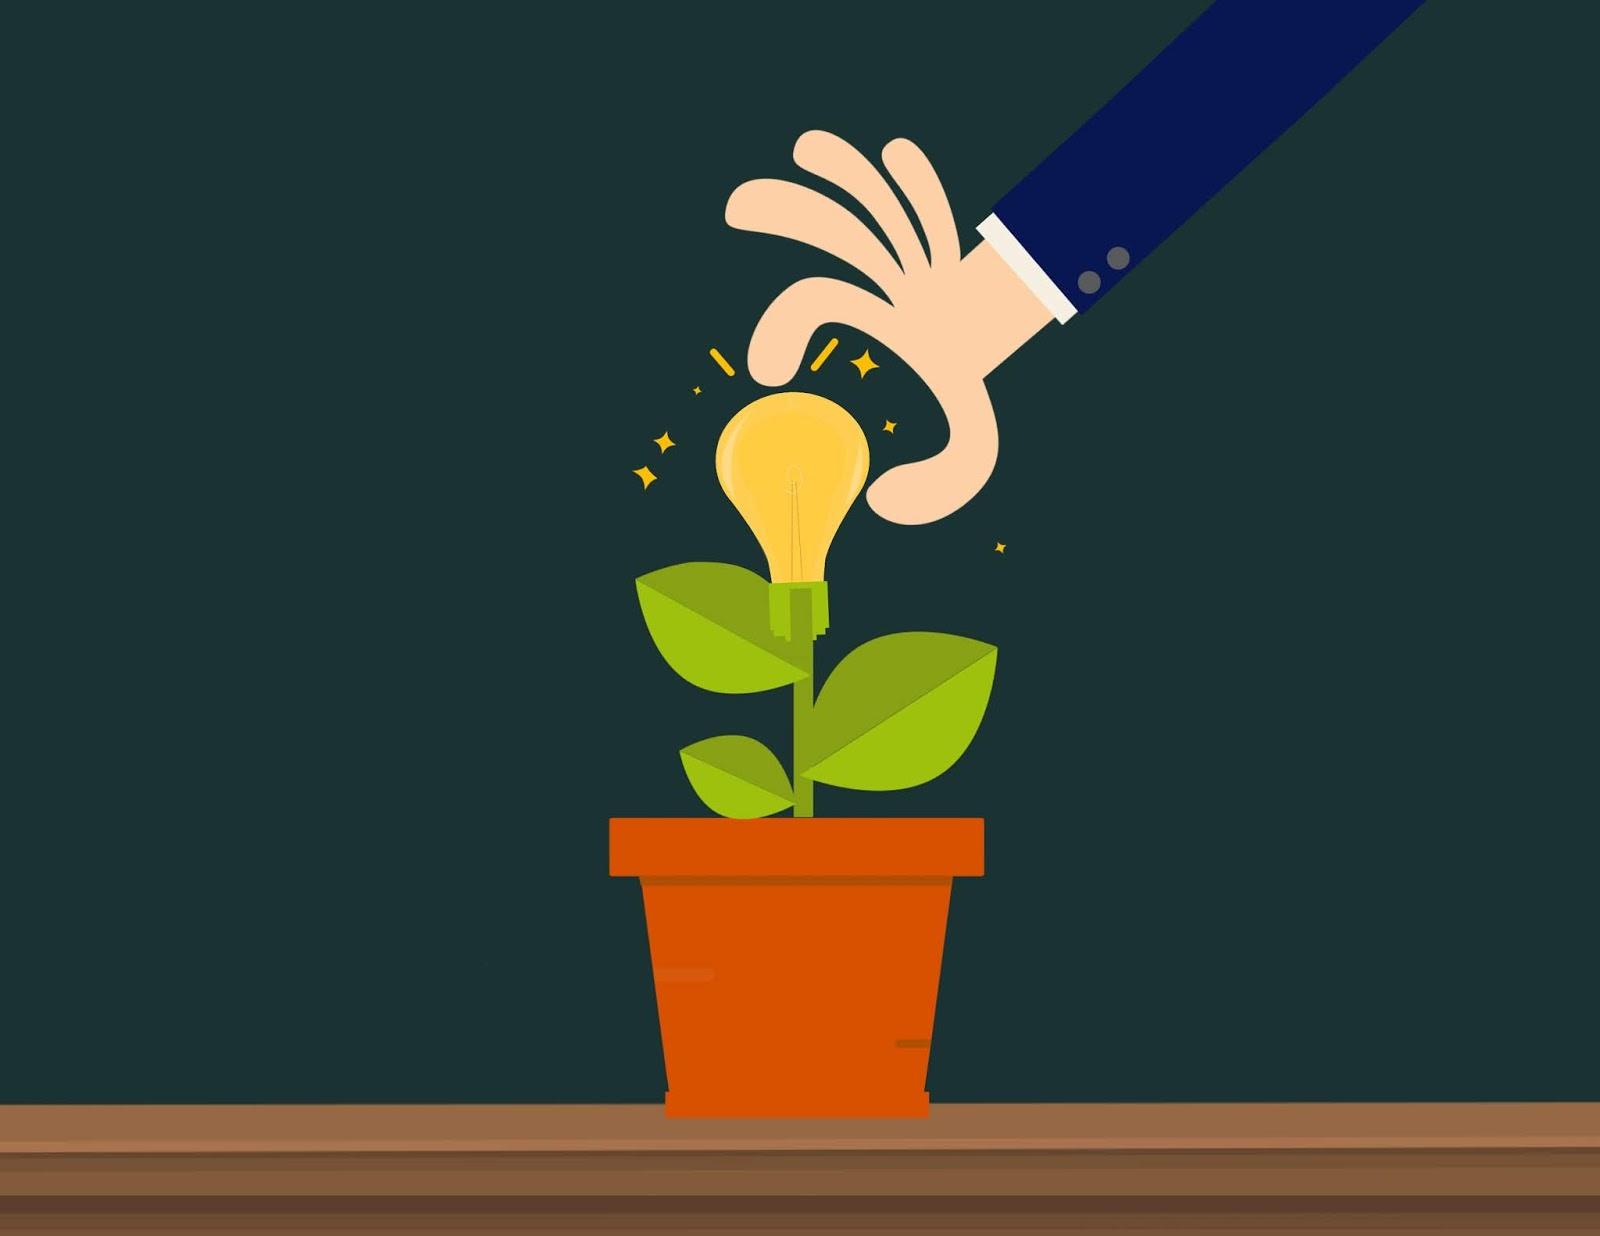 Illustration of growing new idea